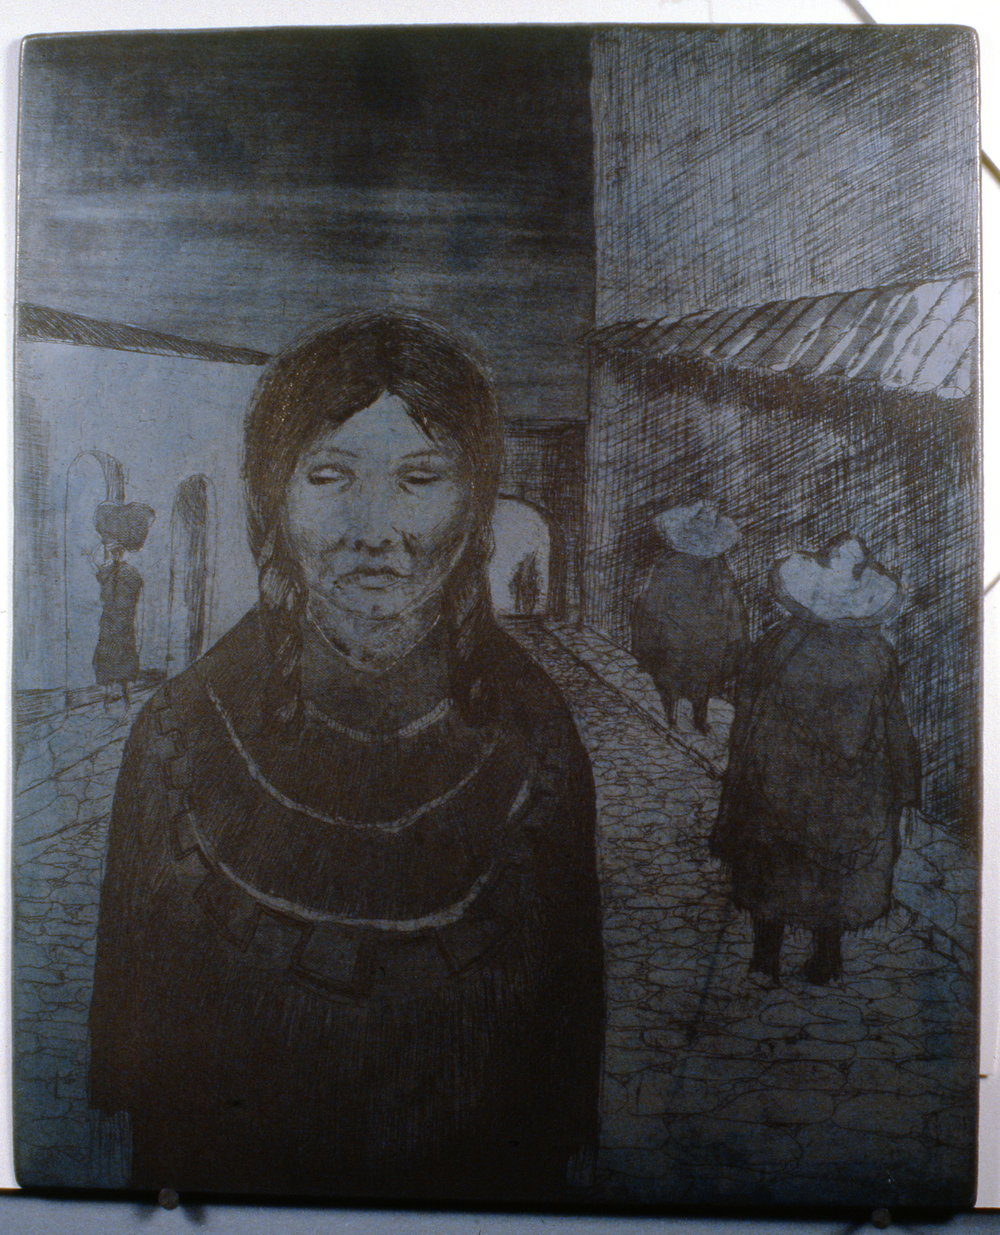 Evening in Mexico, 1978, Minn Sjløseth, metal plate, 30.5 x 25cm, 1996.02.06